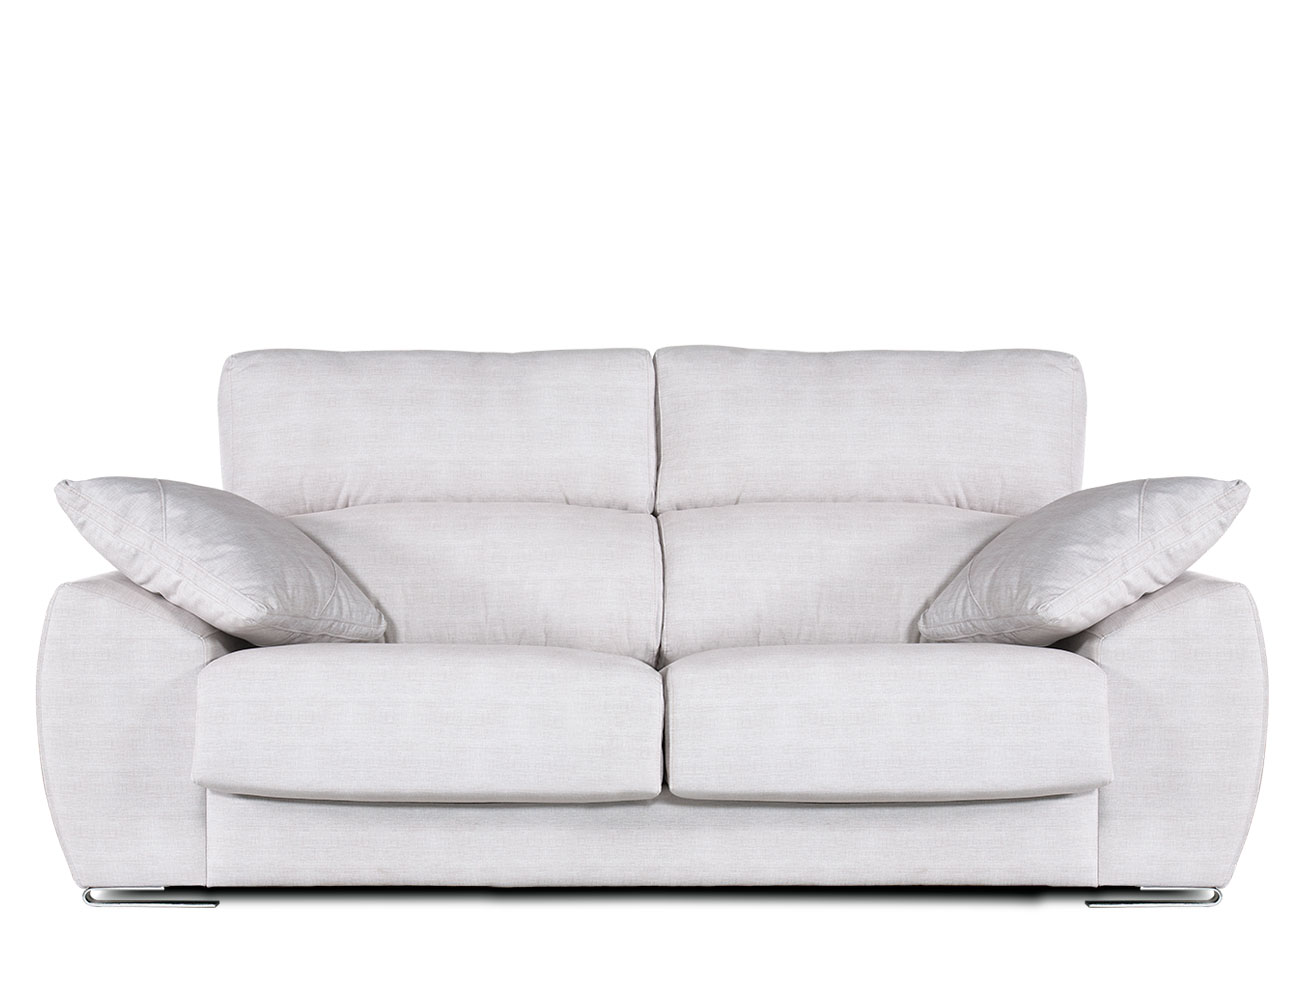 Sofa moderno 3plazas6